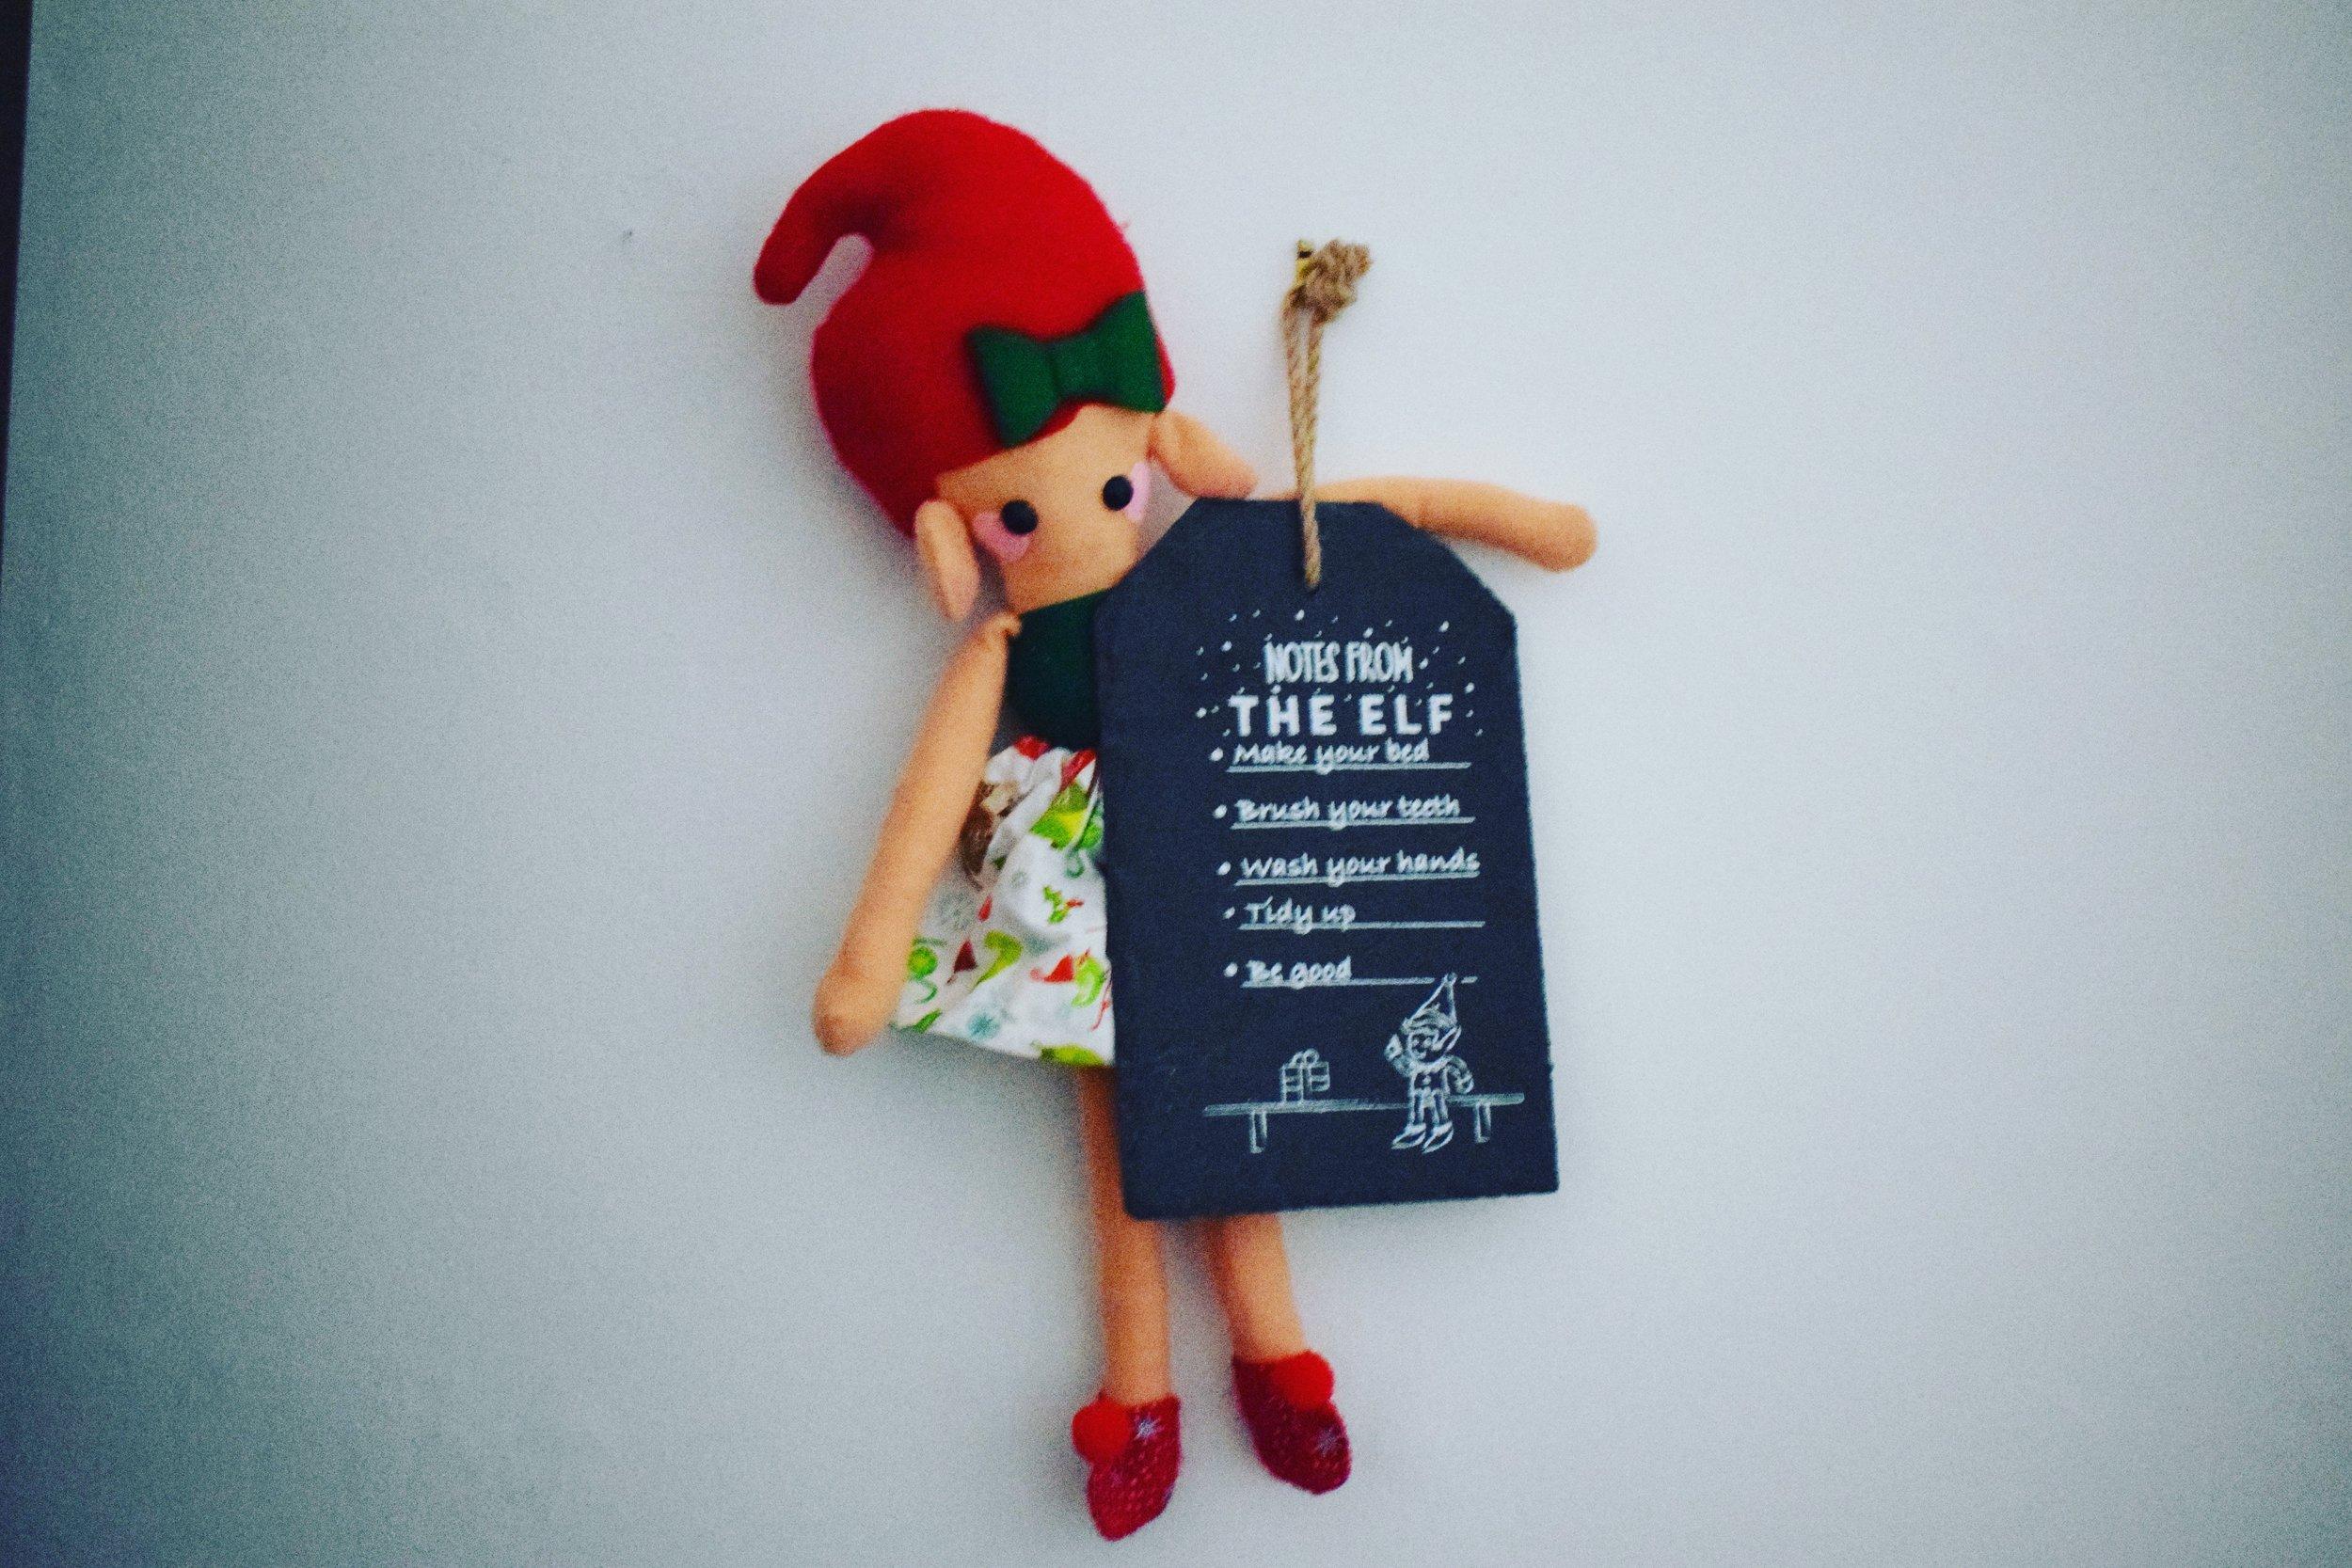 Elf on the Shelf Elf rules